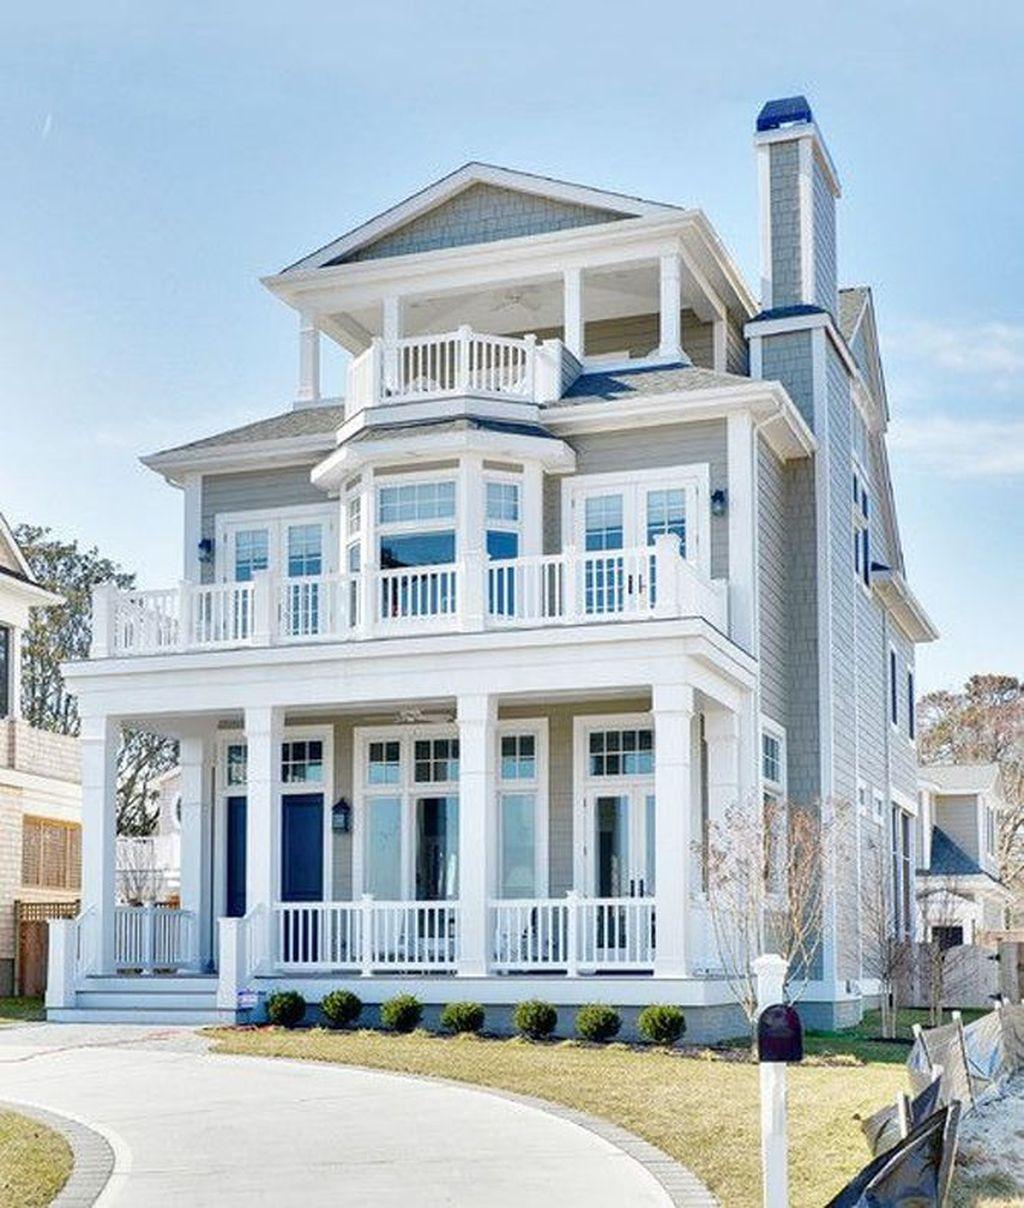 Admirable Beach House Exterior Design Ideas You Will Love 27